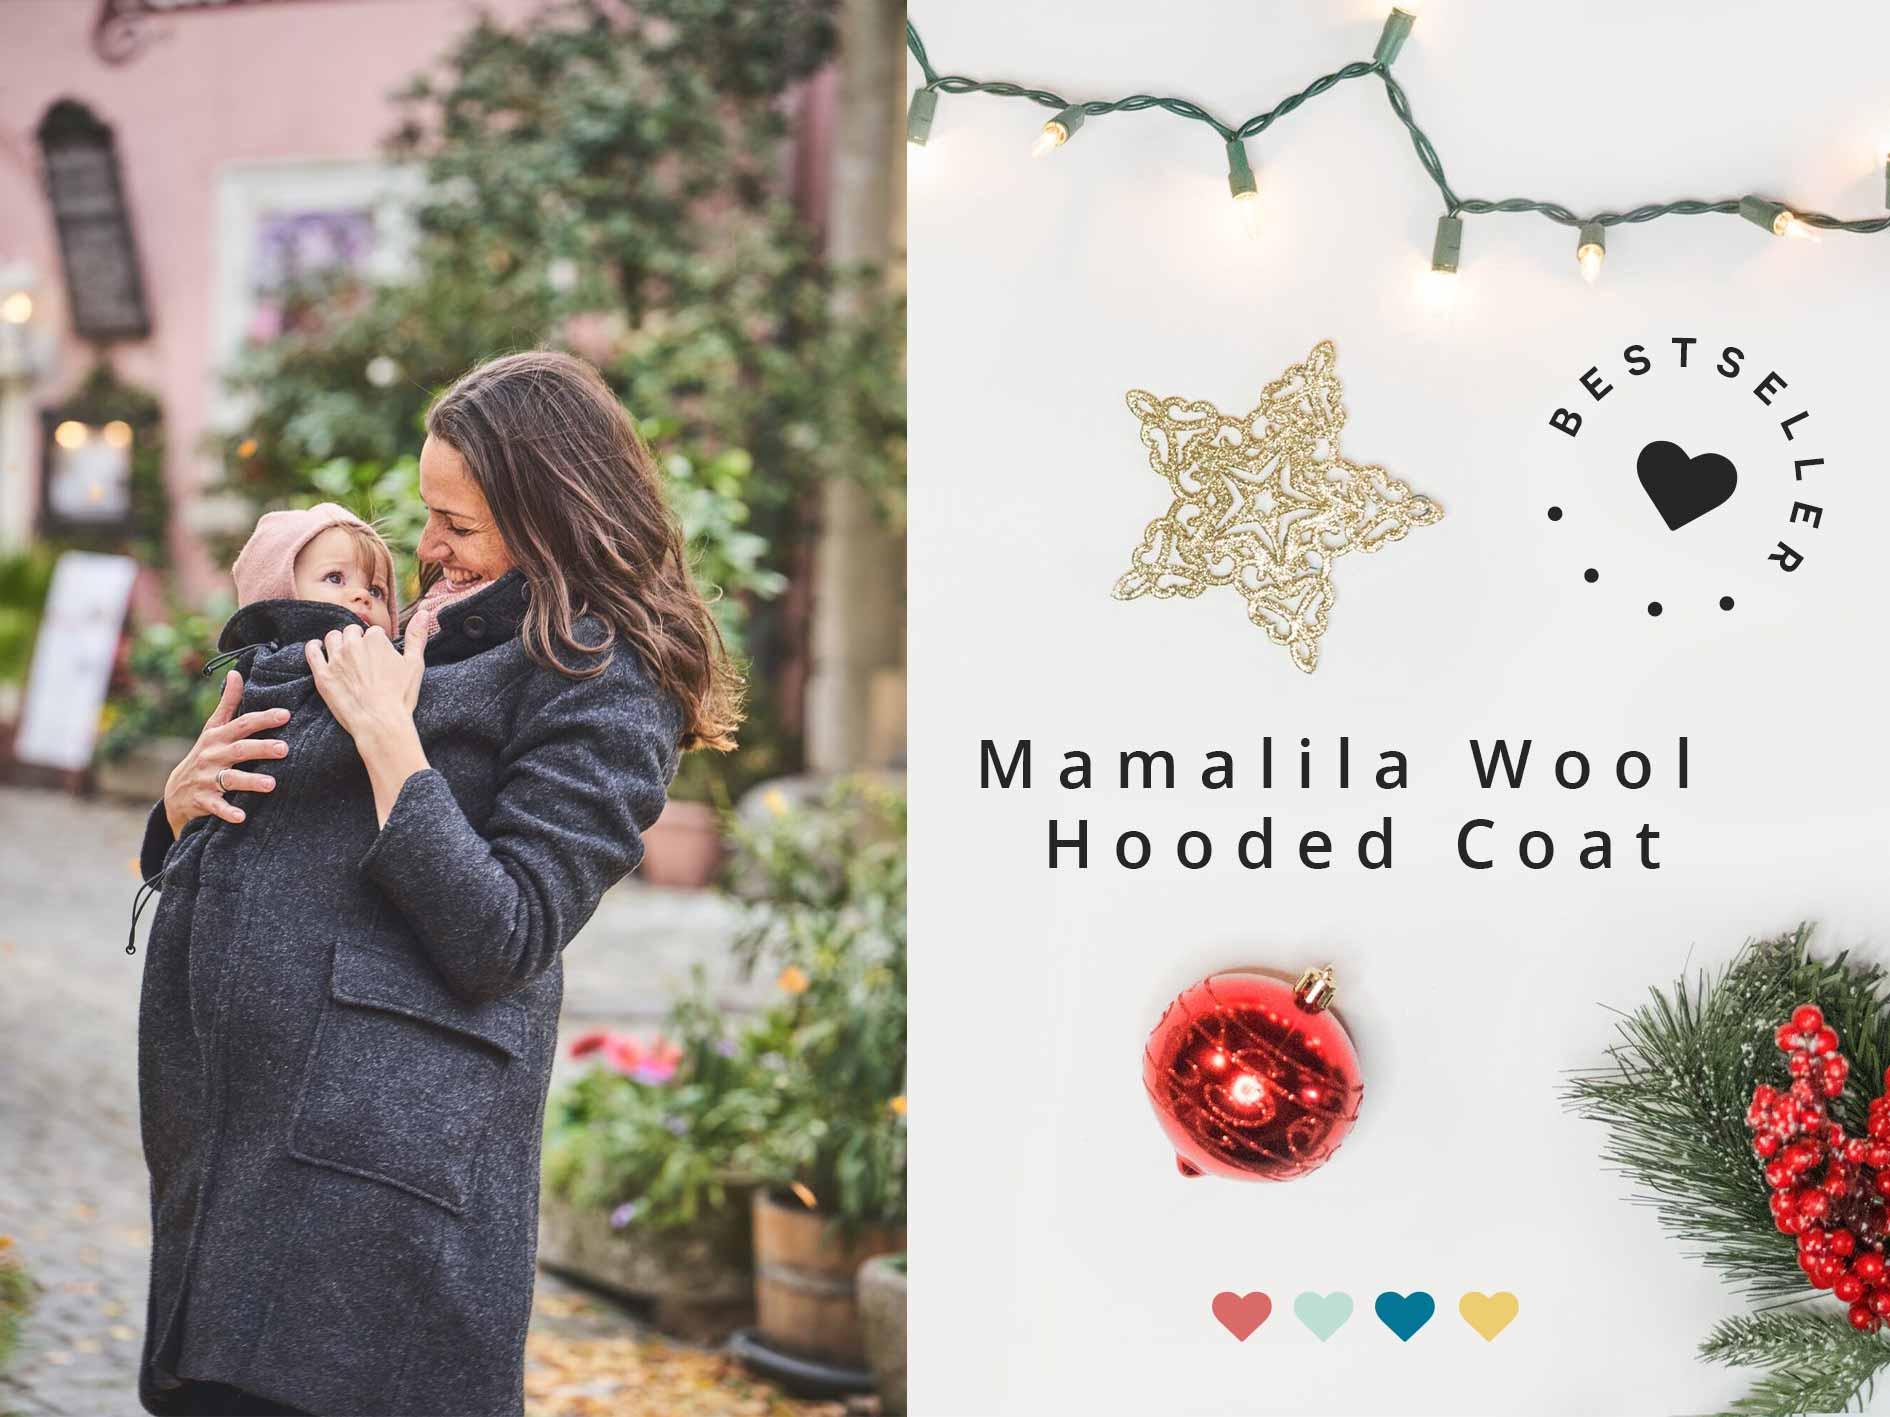 Mamalila Wool Hooded Coat